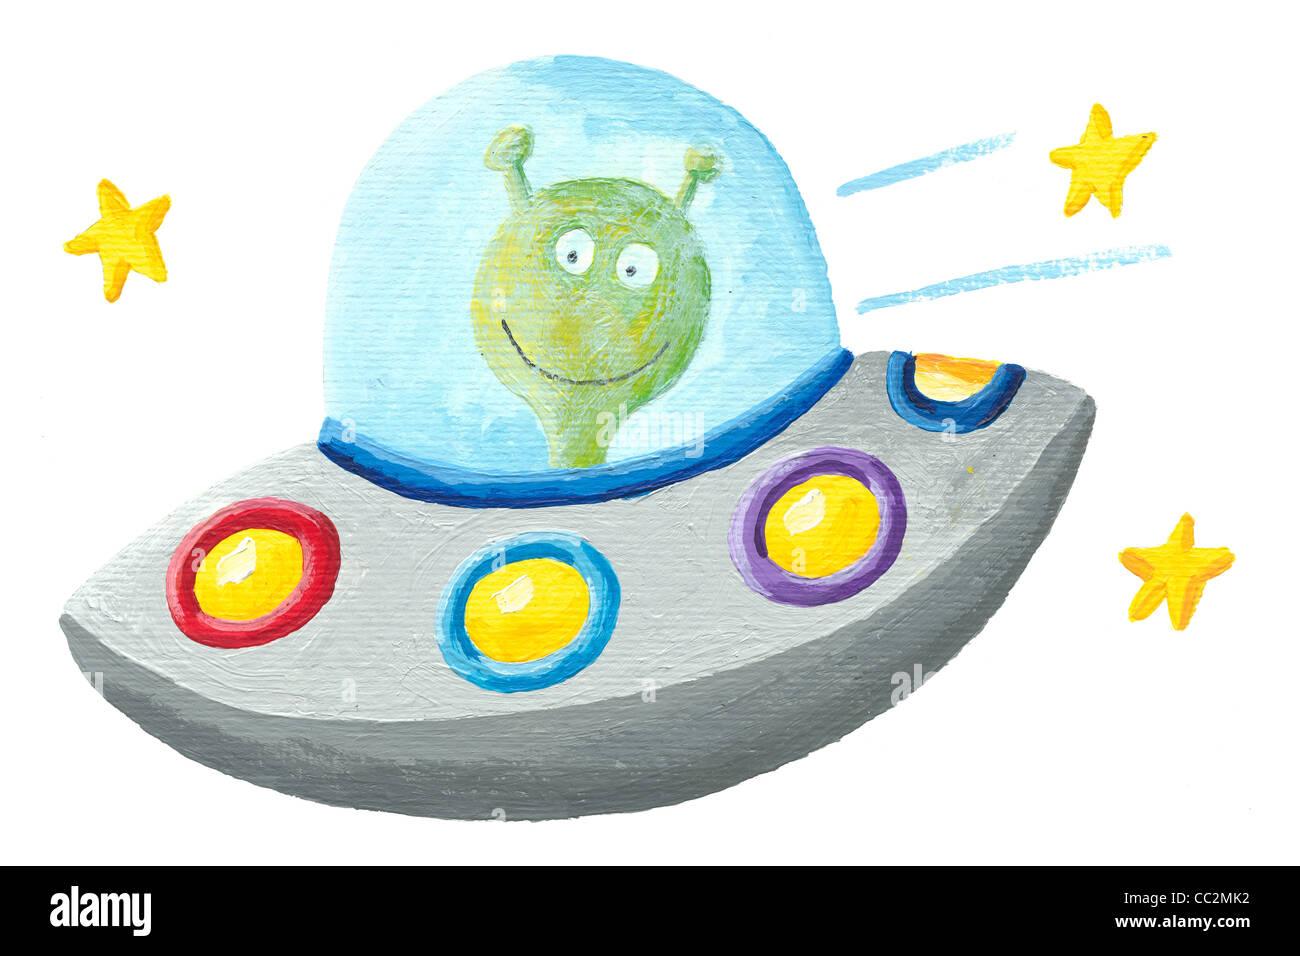 Acrylic illustration of UFO & cute Alien - Stock Image